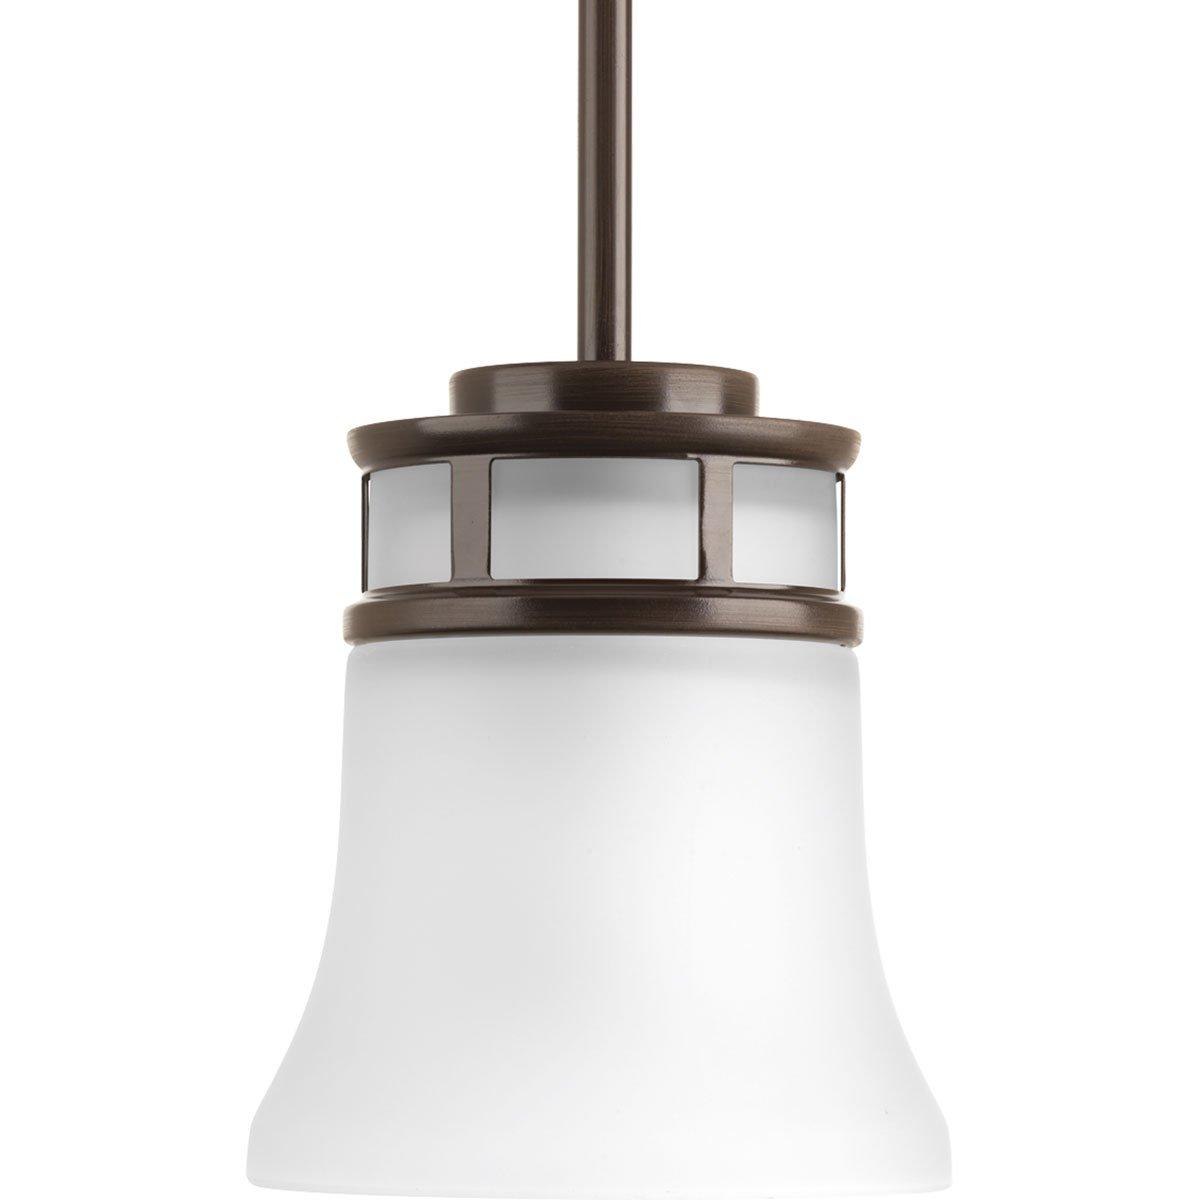 Progress Lighting p5066 – 20 Cascadia 1ライトペンダントwith Flutedシェード、アンティークBR 94506620 1 ブロンズ(antique bronze) ブロンズ(antique bronze) B01AISIVBS